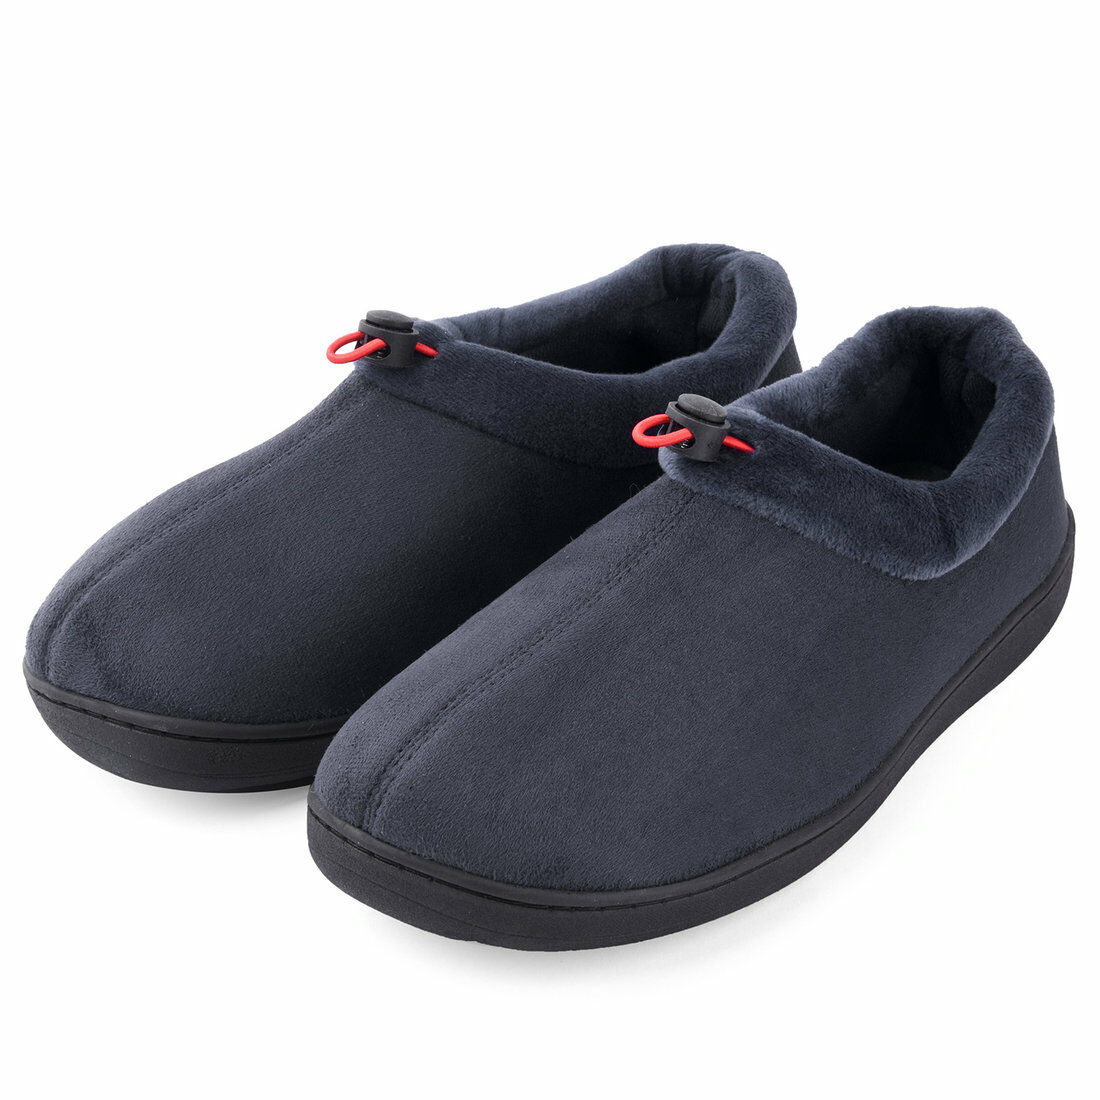 f9f6282a4c3b Dasein Men s Comfort Memory Foam Micro Suede Moccasin Slippers ...